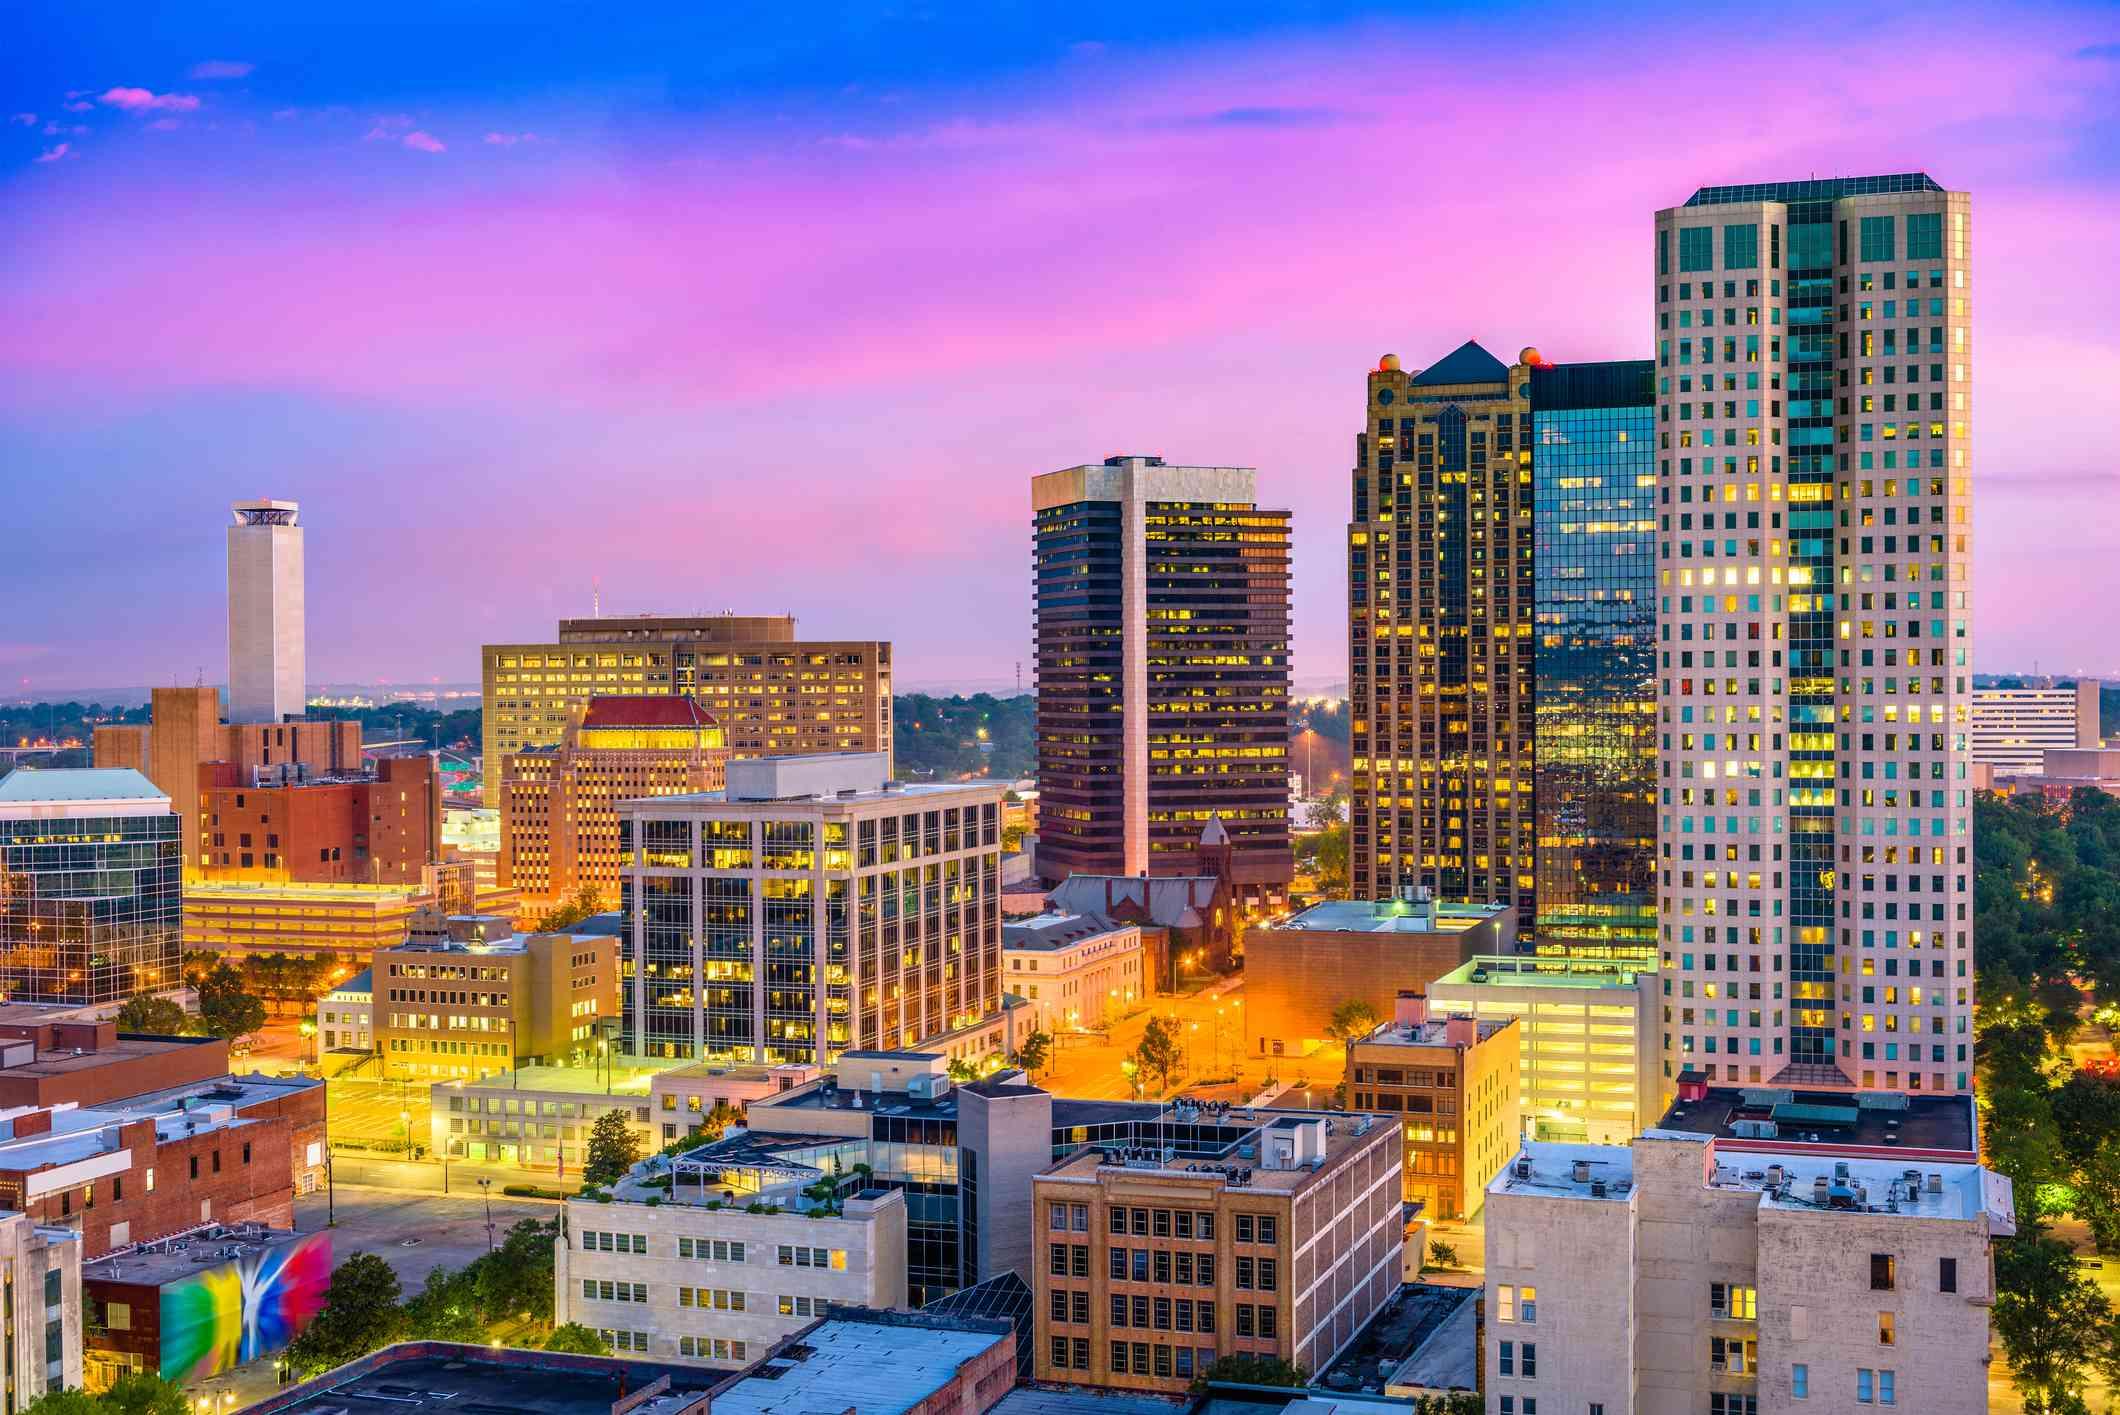 Birmingham, Alabama Skyline at sunset